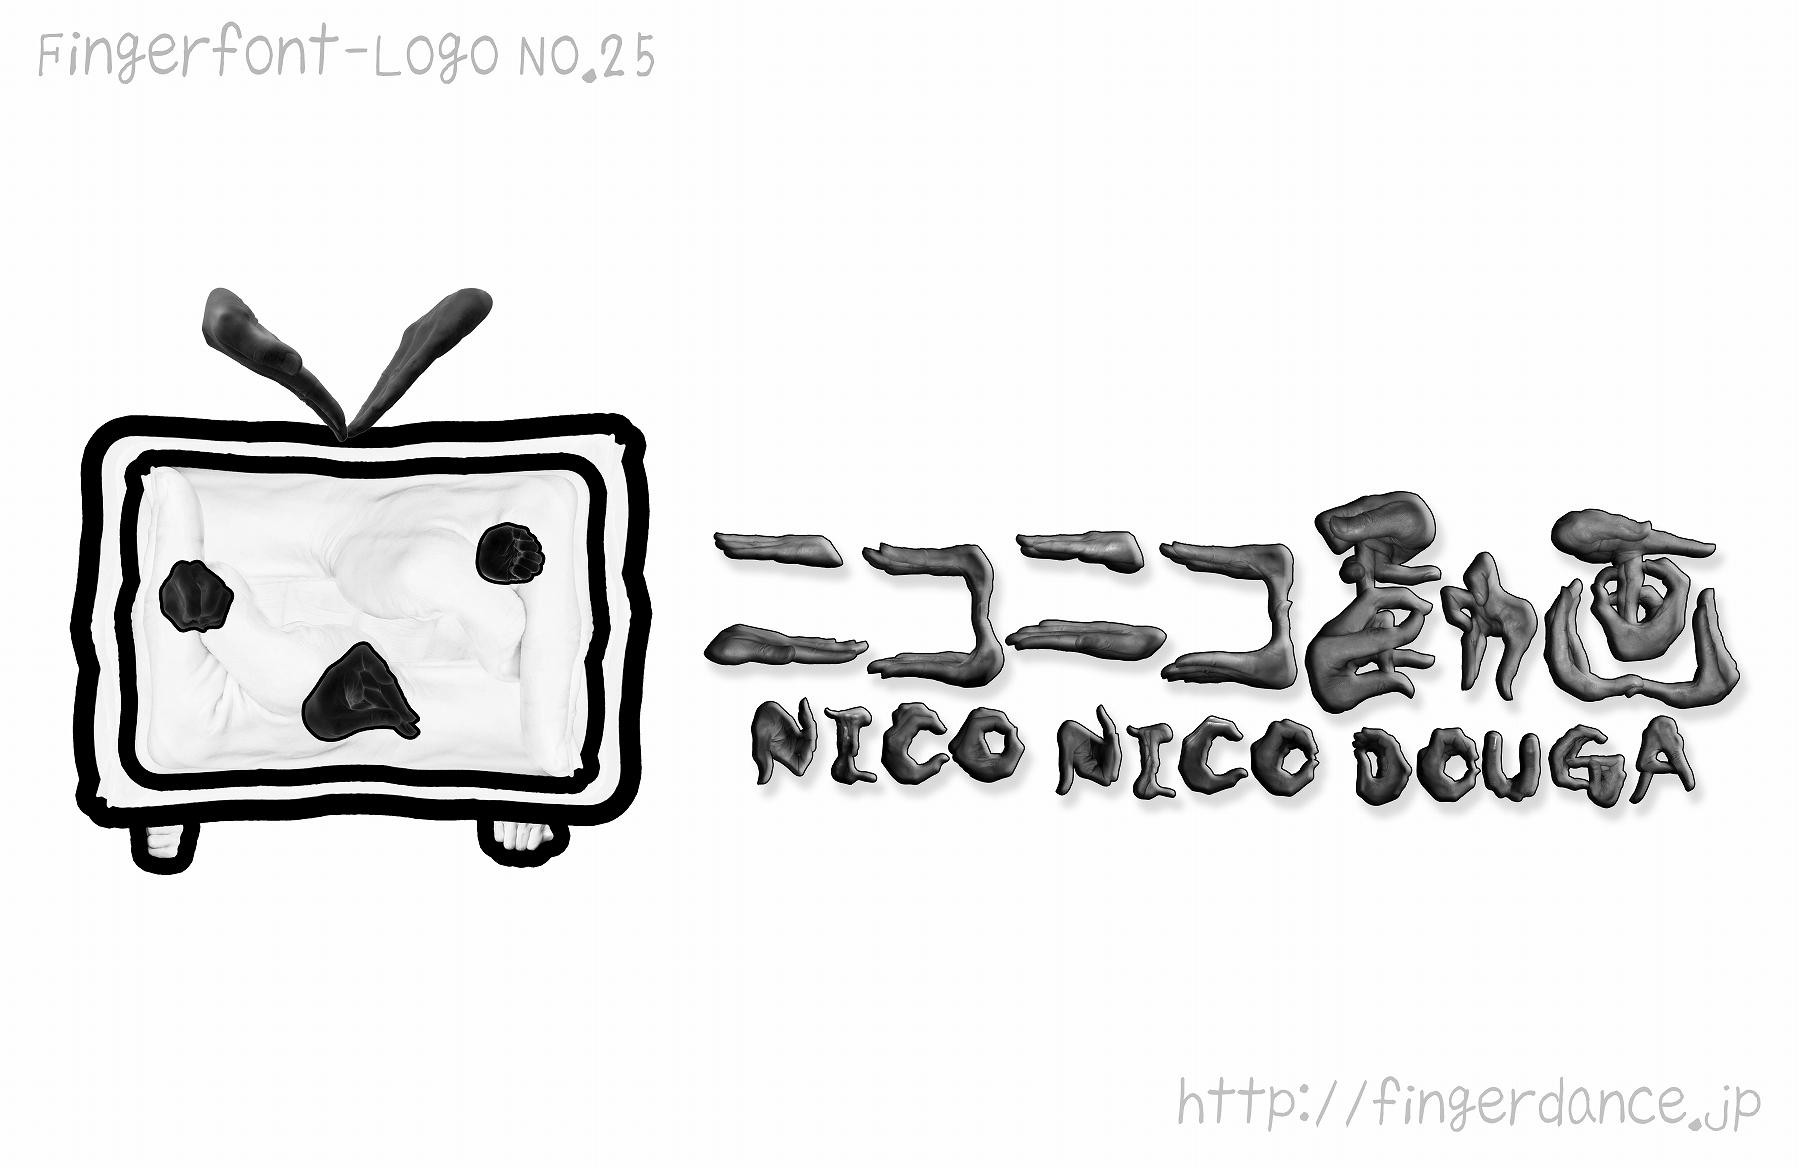 niconico douga-fingerlogohand ニコニコ動画フィンガーロゴハンド手指